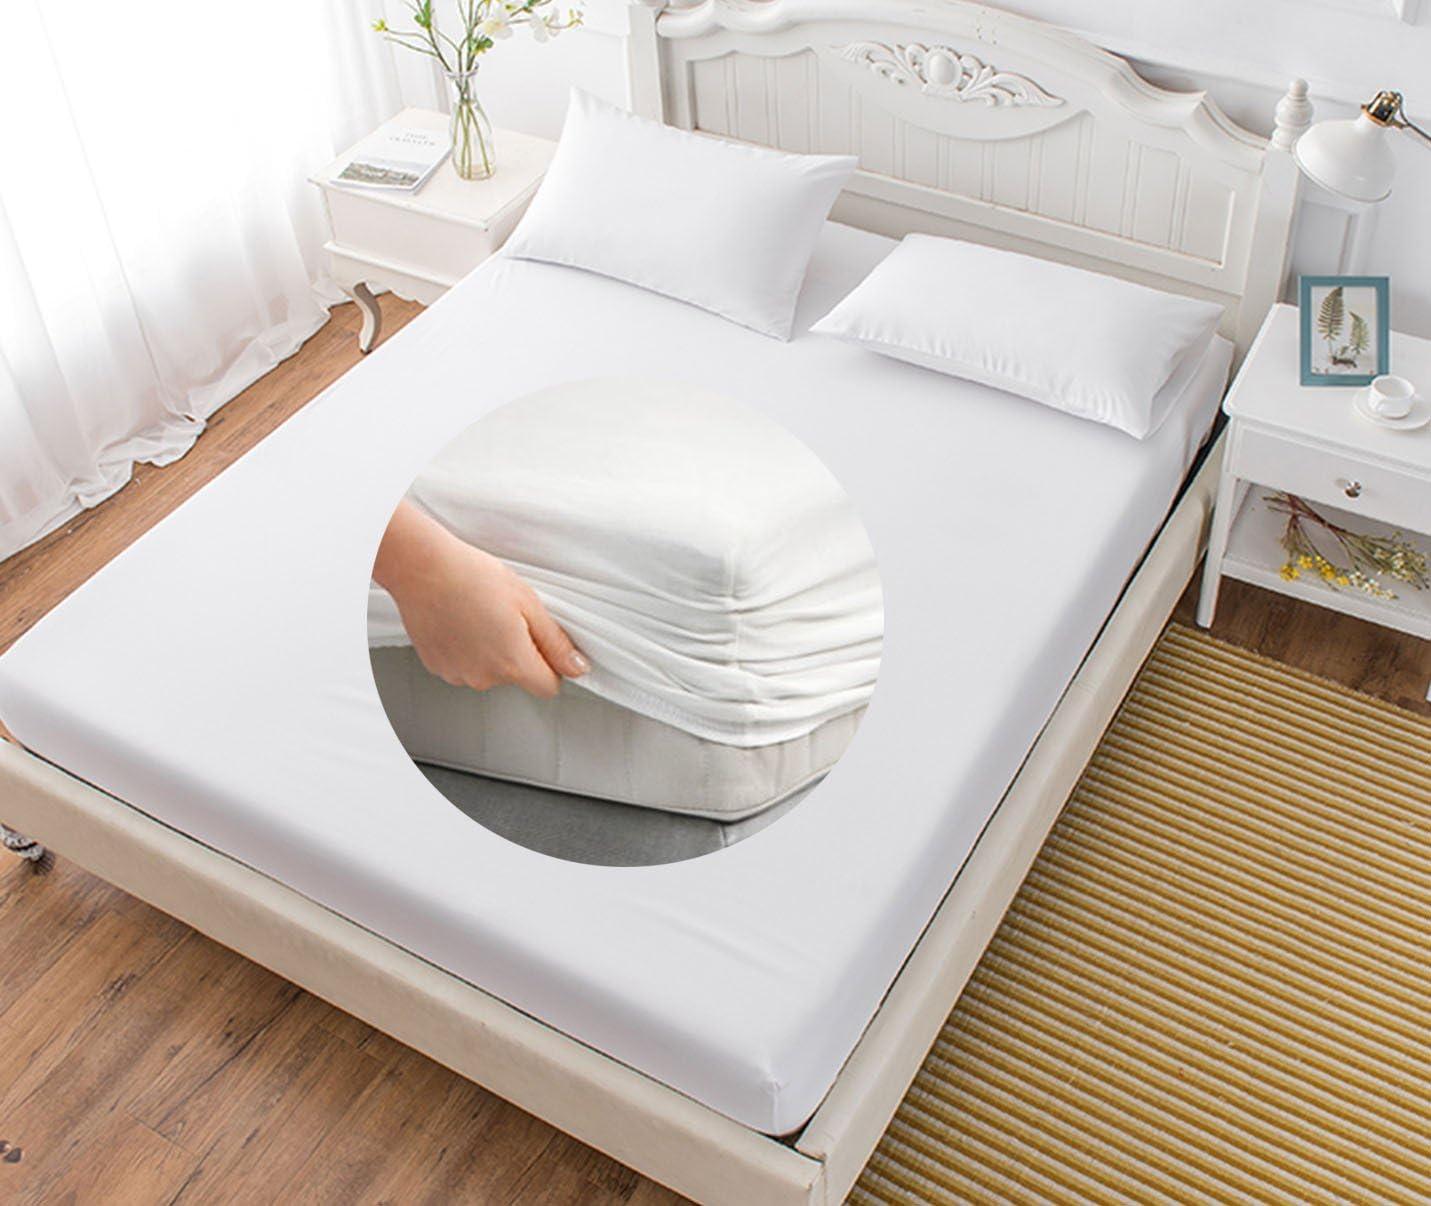 EM HOME S/ábana Bajera Ajustable el/ástica 50/% algod/ón y 50/% poli/éster Color Blanco 135x190cm